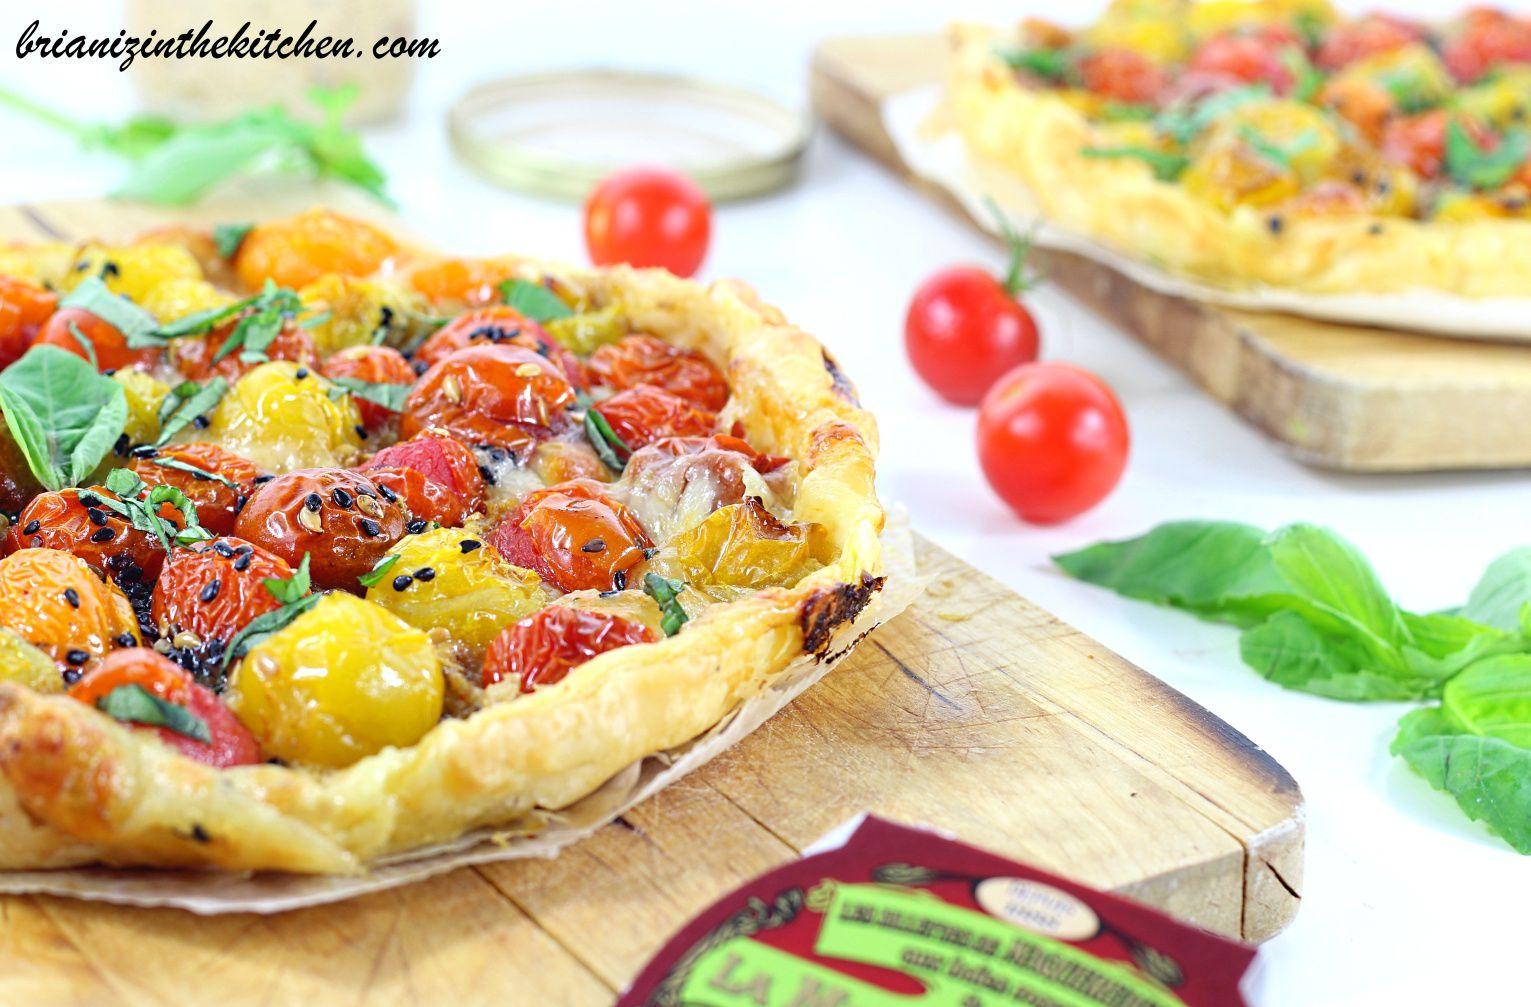 Tarte Fine Tomates Cerises, Rillettes de Maquereau, Moutarde & Mozza